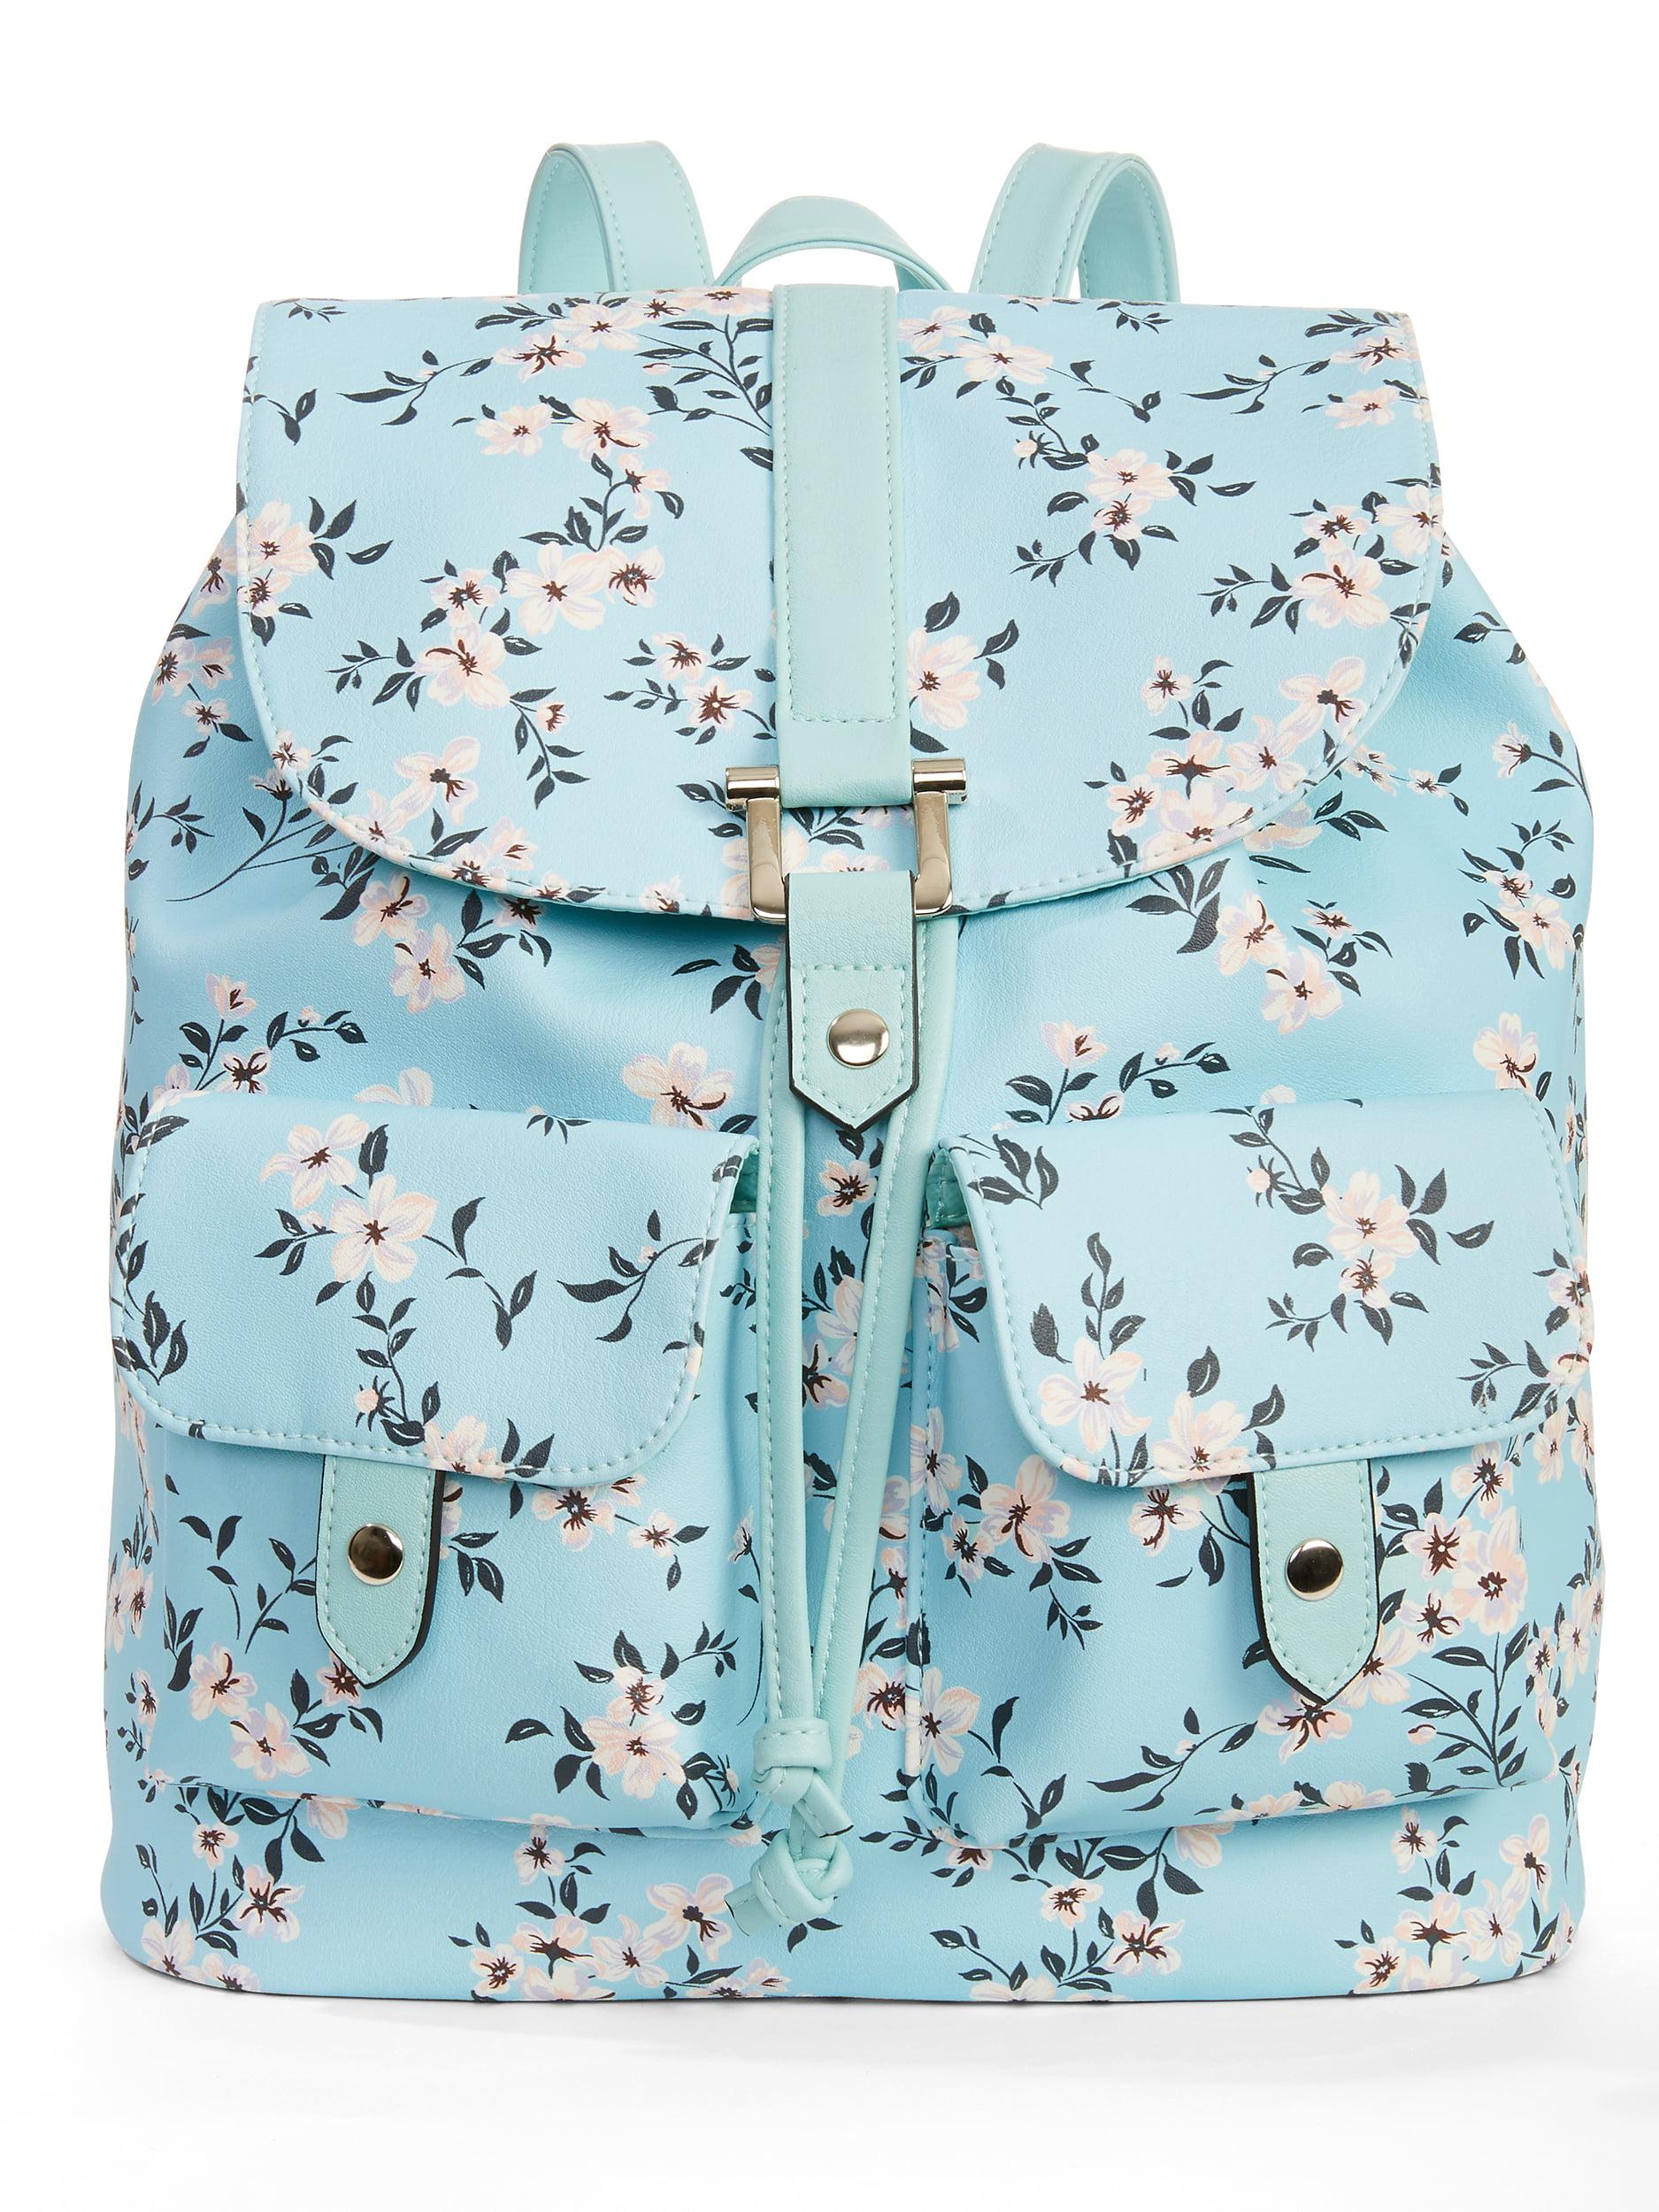 No Boundaries PVC Cargo Backpack